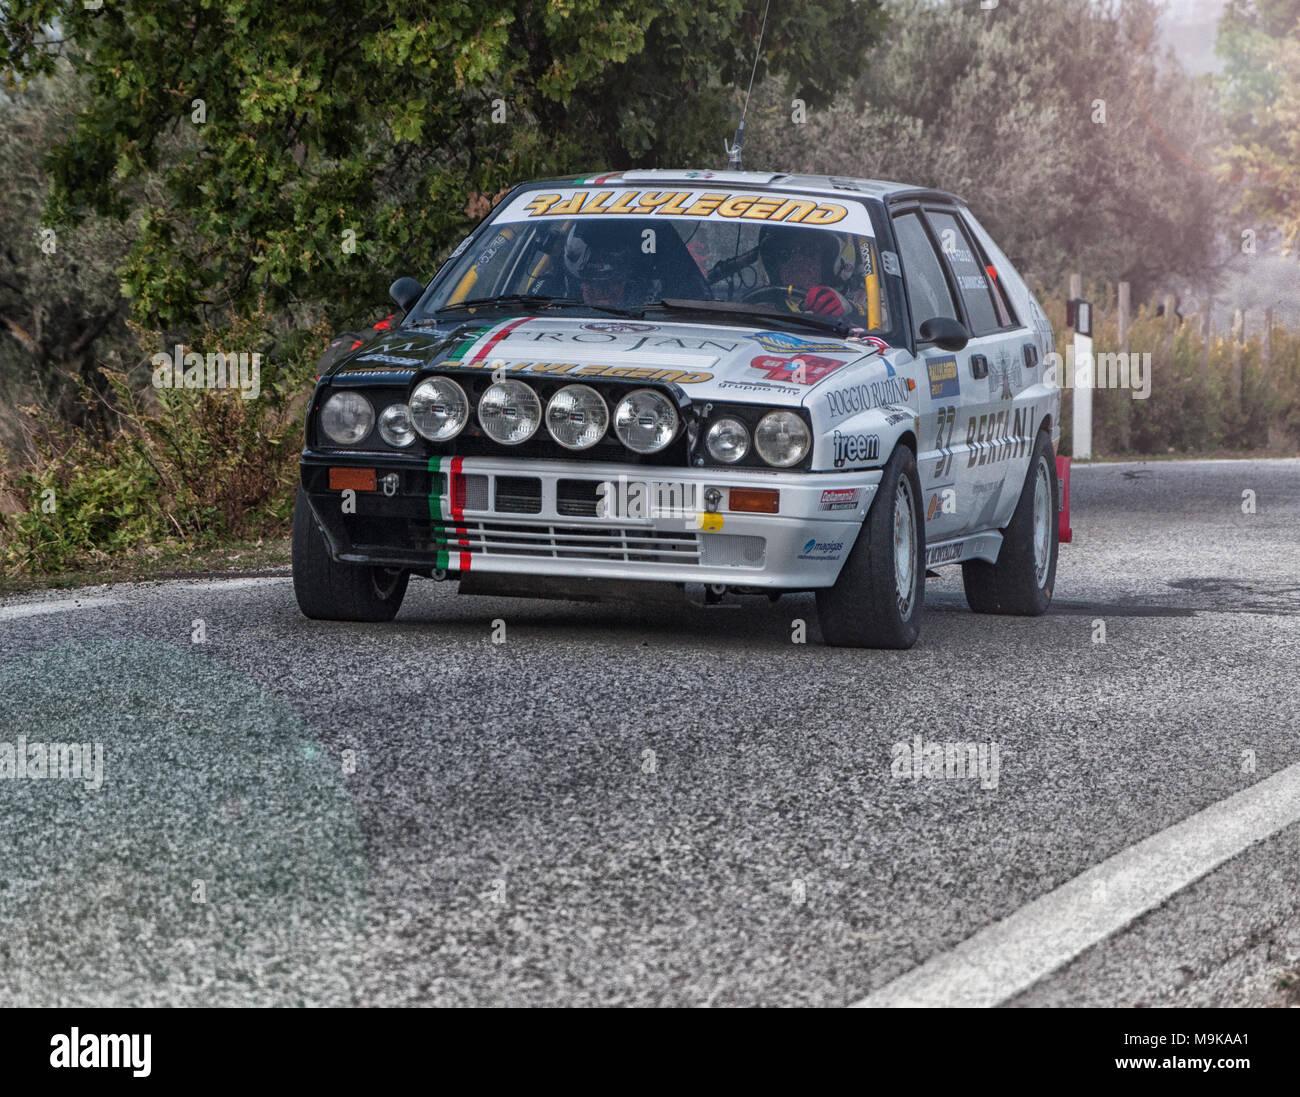 SANMARINO, SANMARINO - OTT 21, 2017 : LANCIA DELTA INT. 16V 1989 in old racing car rally THE LEGEND 2017 the famous SAN MARINO historical race - Stock Image